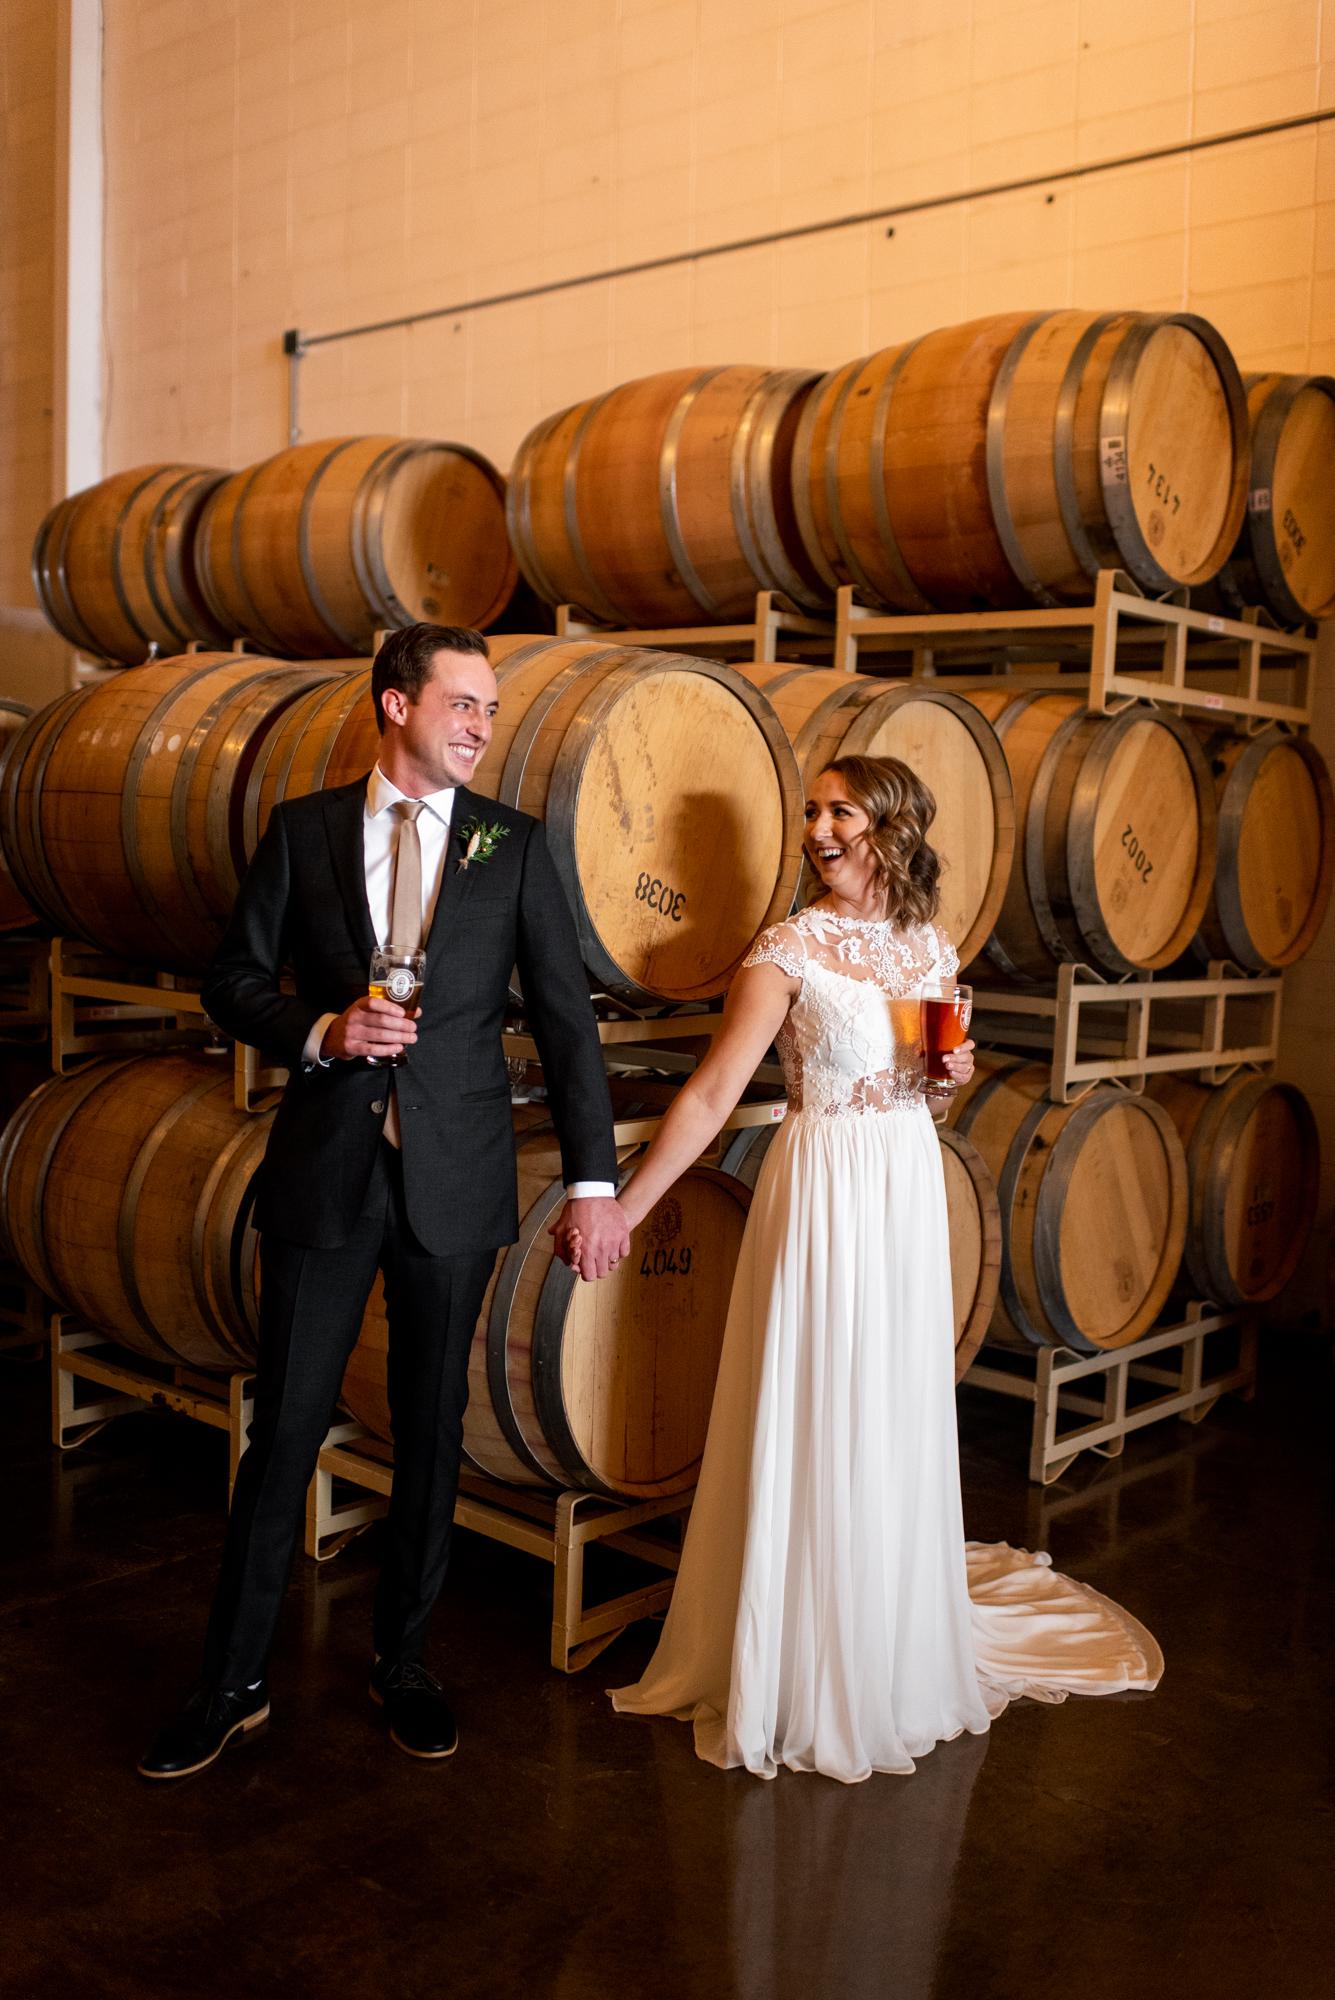 Alberta brewery wedding bride and groom in front of beer barrels